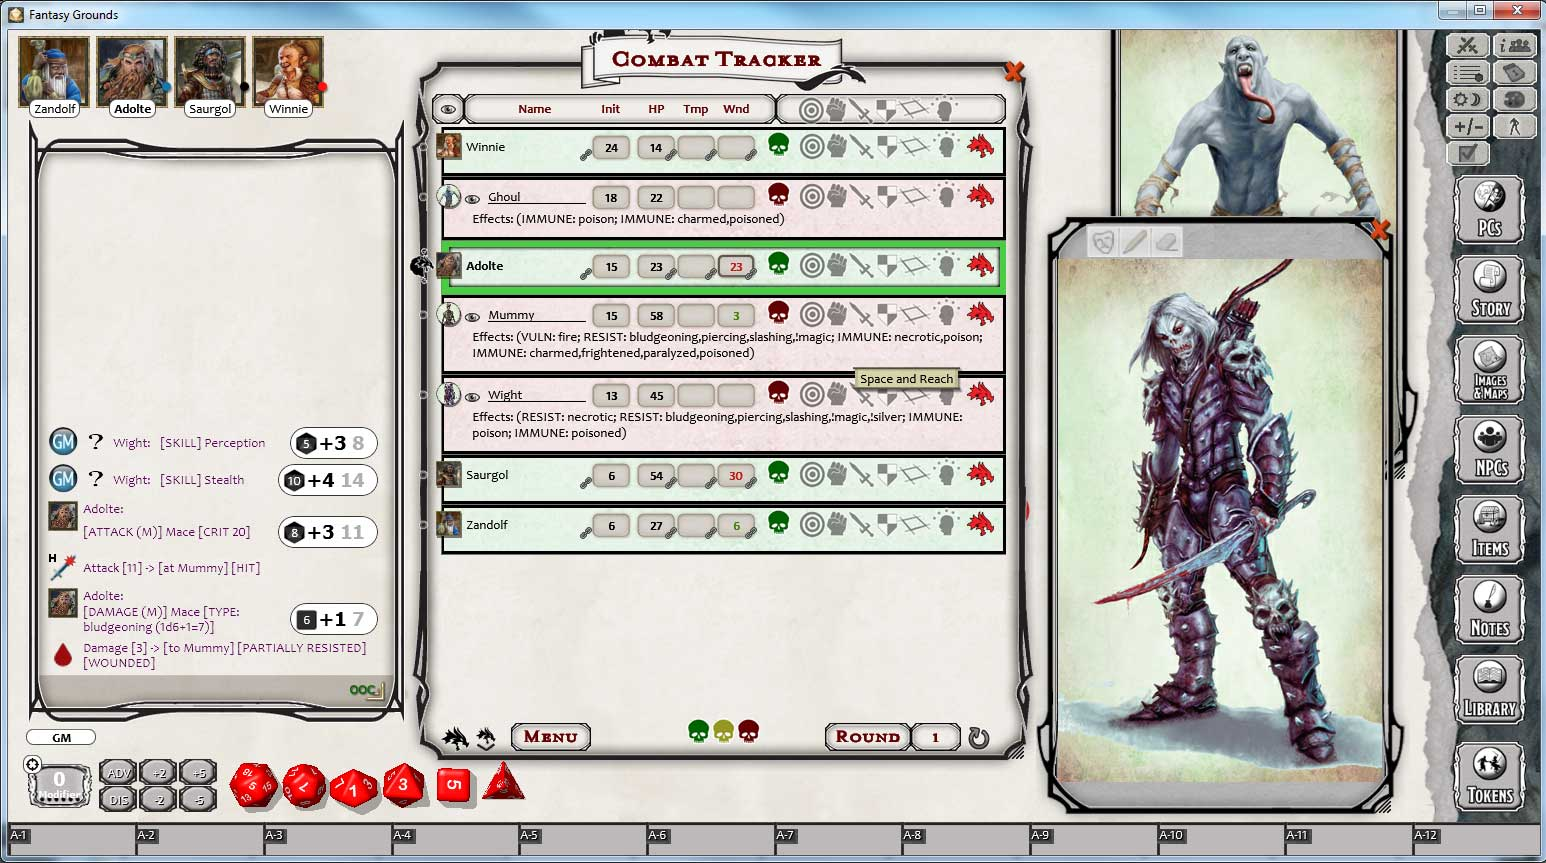 d&d 3.5 monster manual 3.0